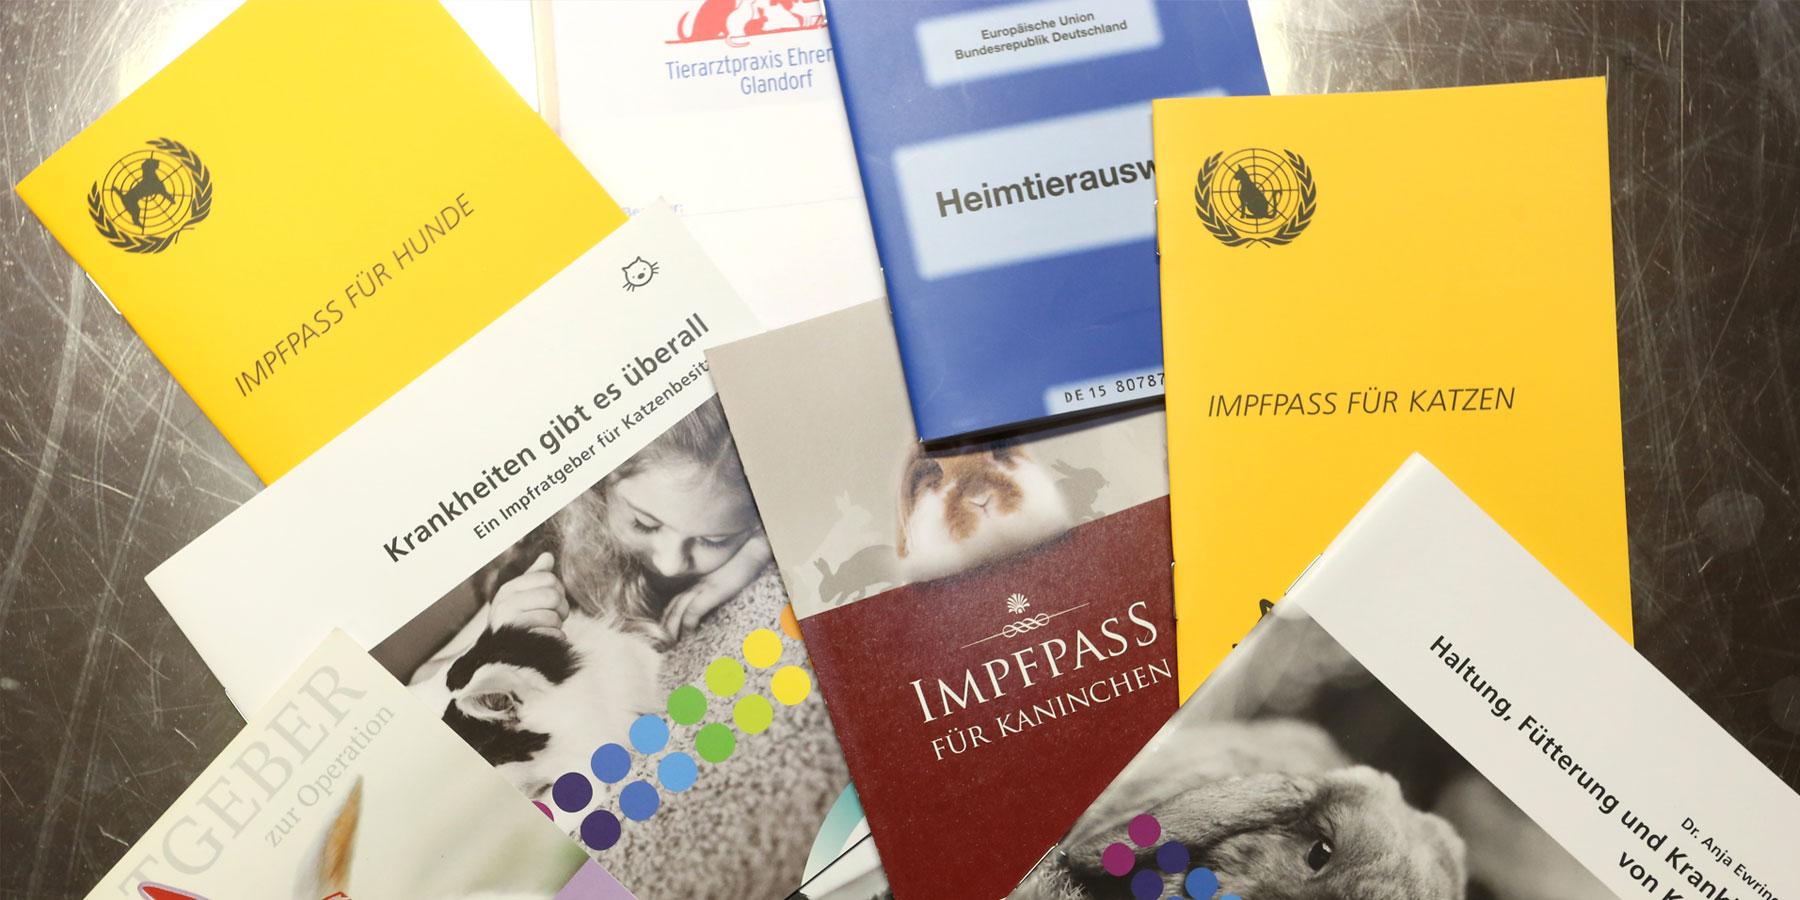 Prophylaxe Tierarztpraxis Ehrenbrink